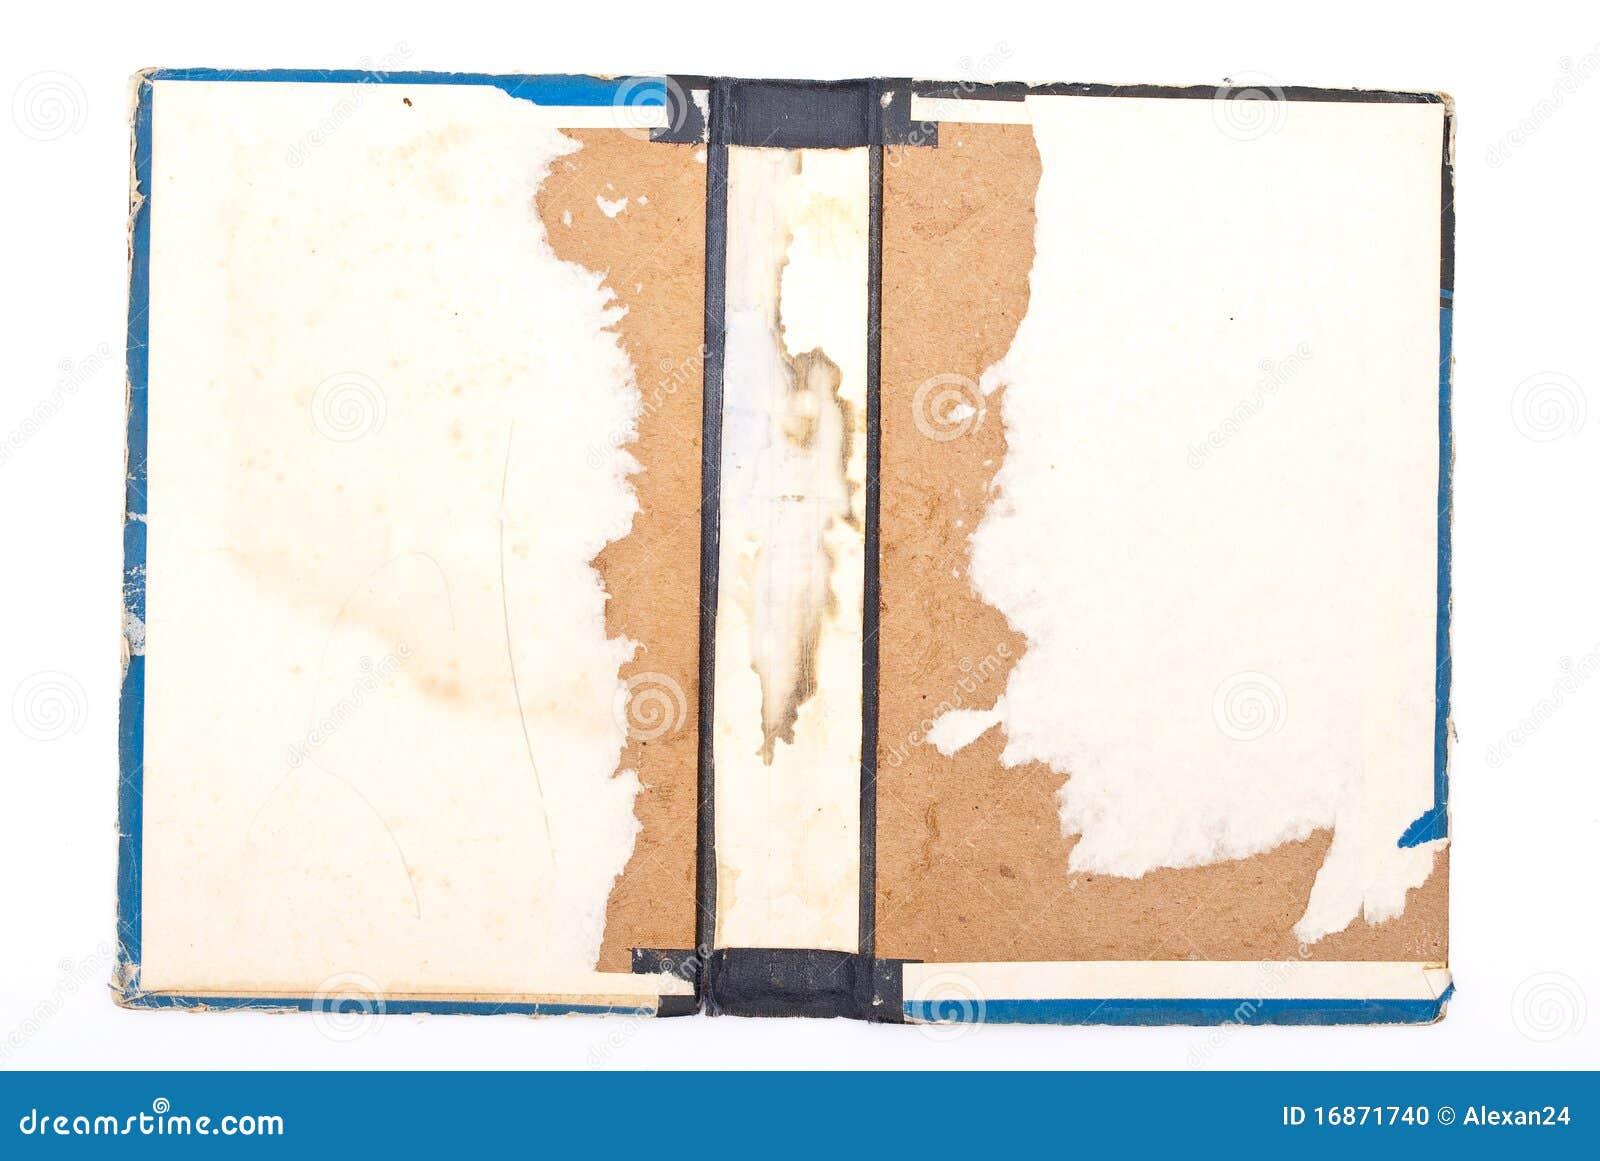 Livro rasgado antigo